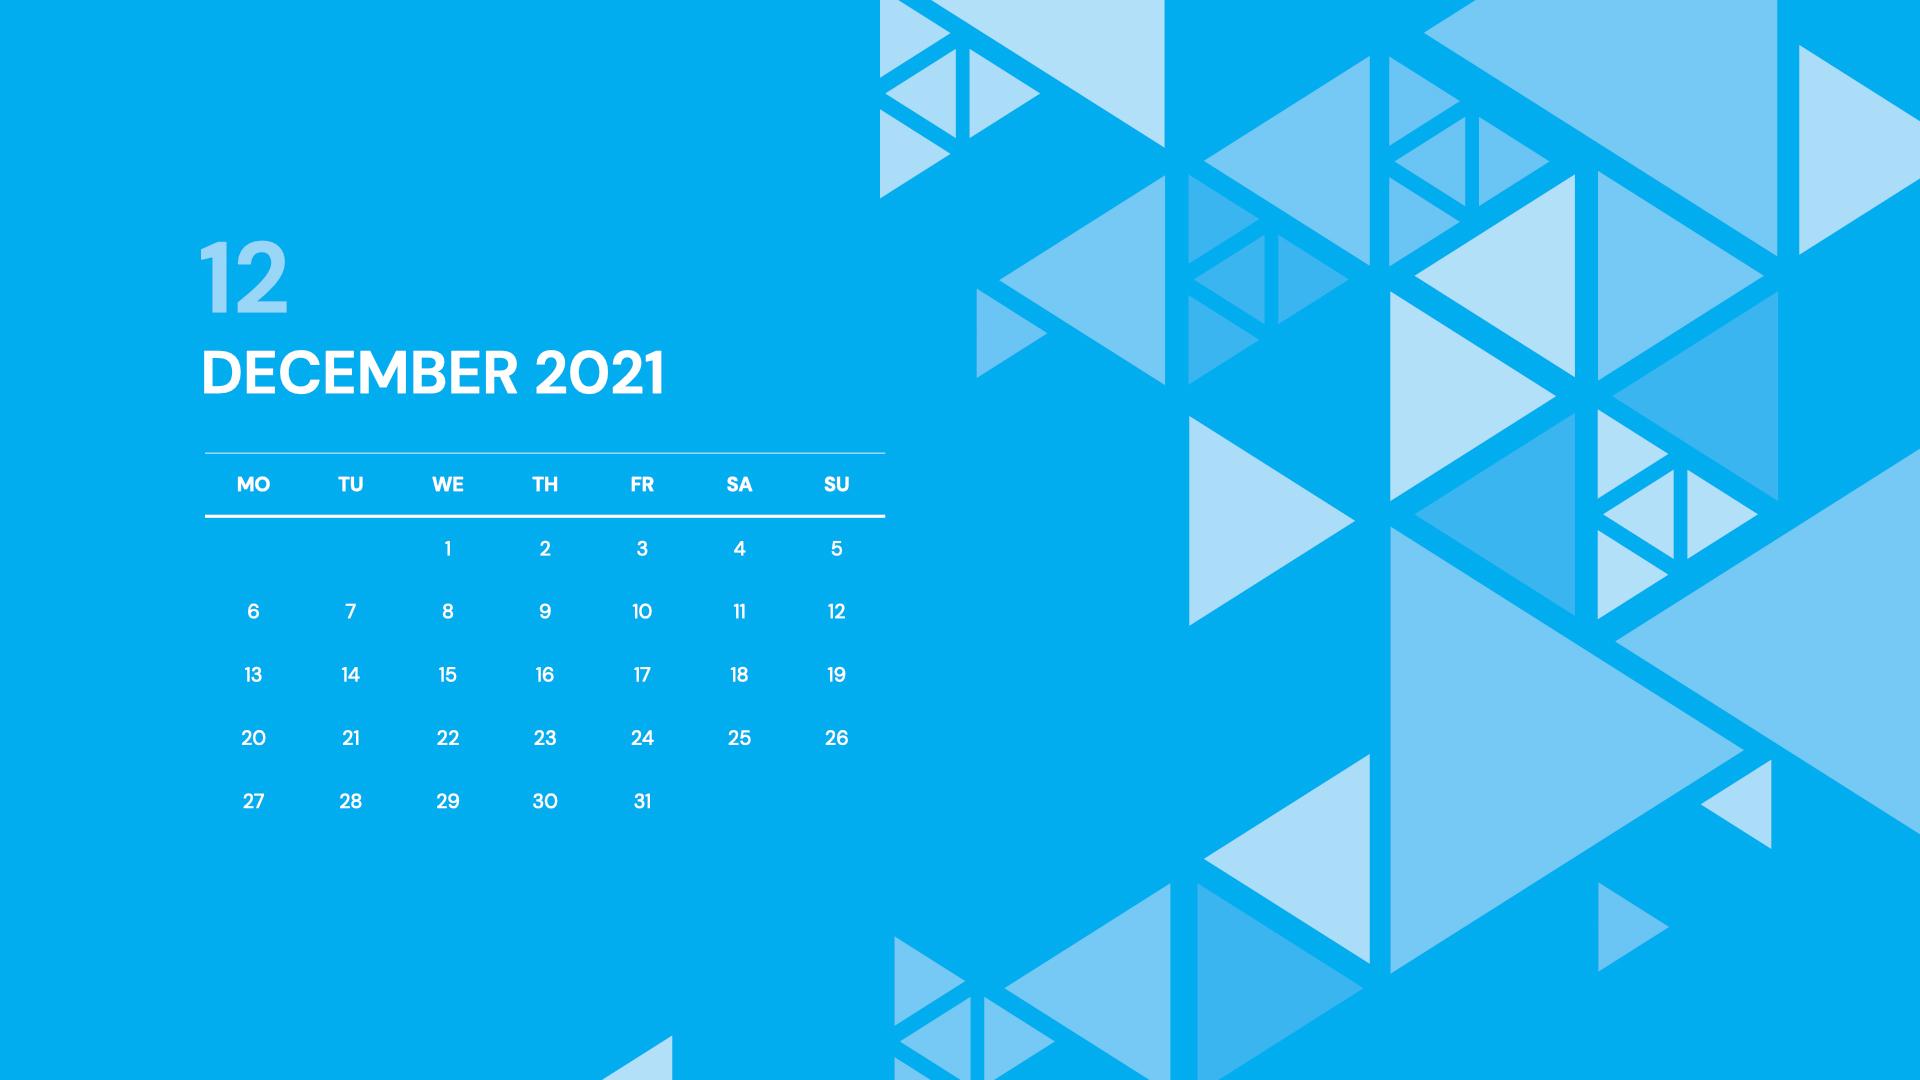 2021 Powerpoint Calendar Template  Free Download Now! regarding December Calendar 2021 Empire And Puzzles